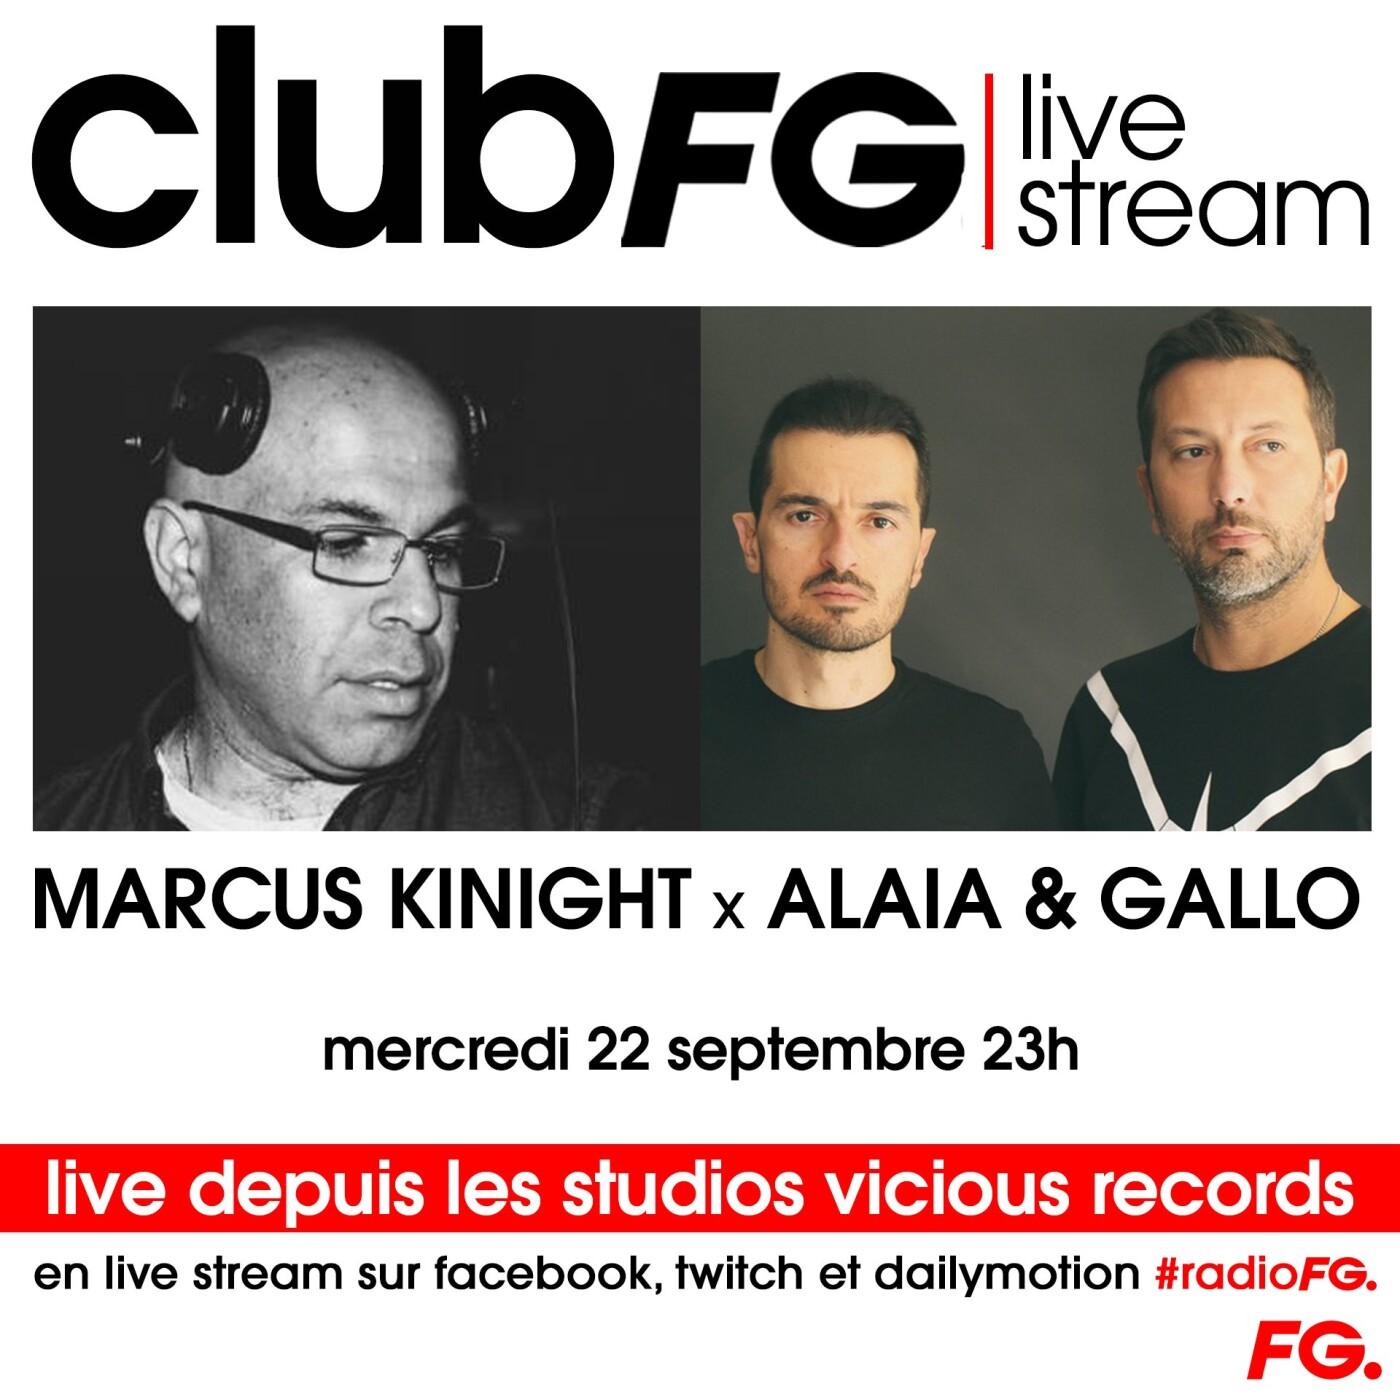 CLUB FG LIVE STREAM : MARCUS KNIGHT X ALAIA & GALLO